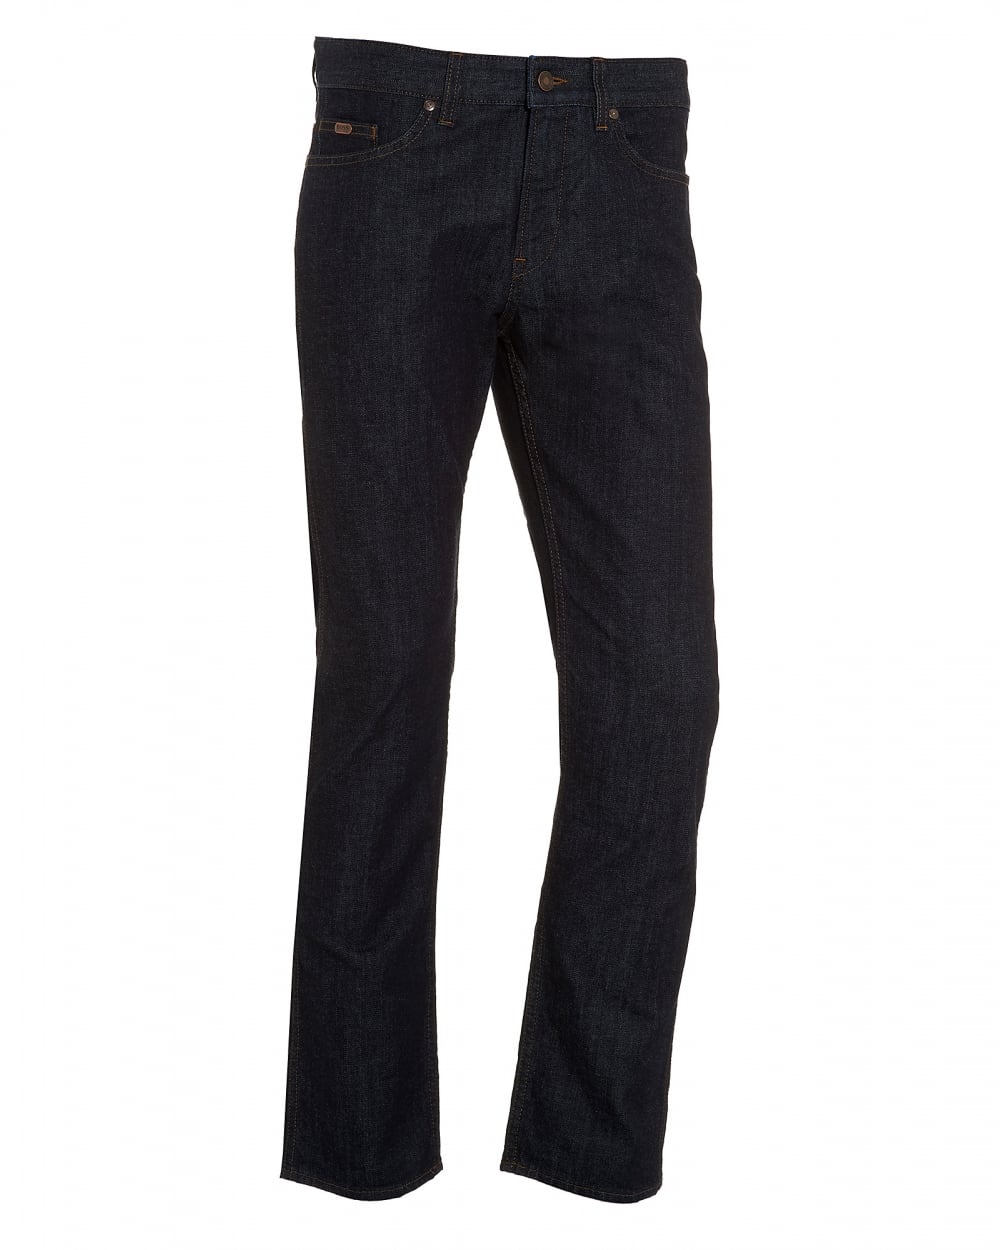 d64beb41 Hugo Boss Green Mens C-Delaware1 Jean, Slim Fit Dark Indigo Jeans